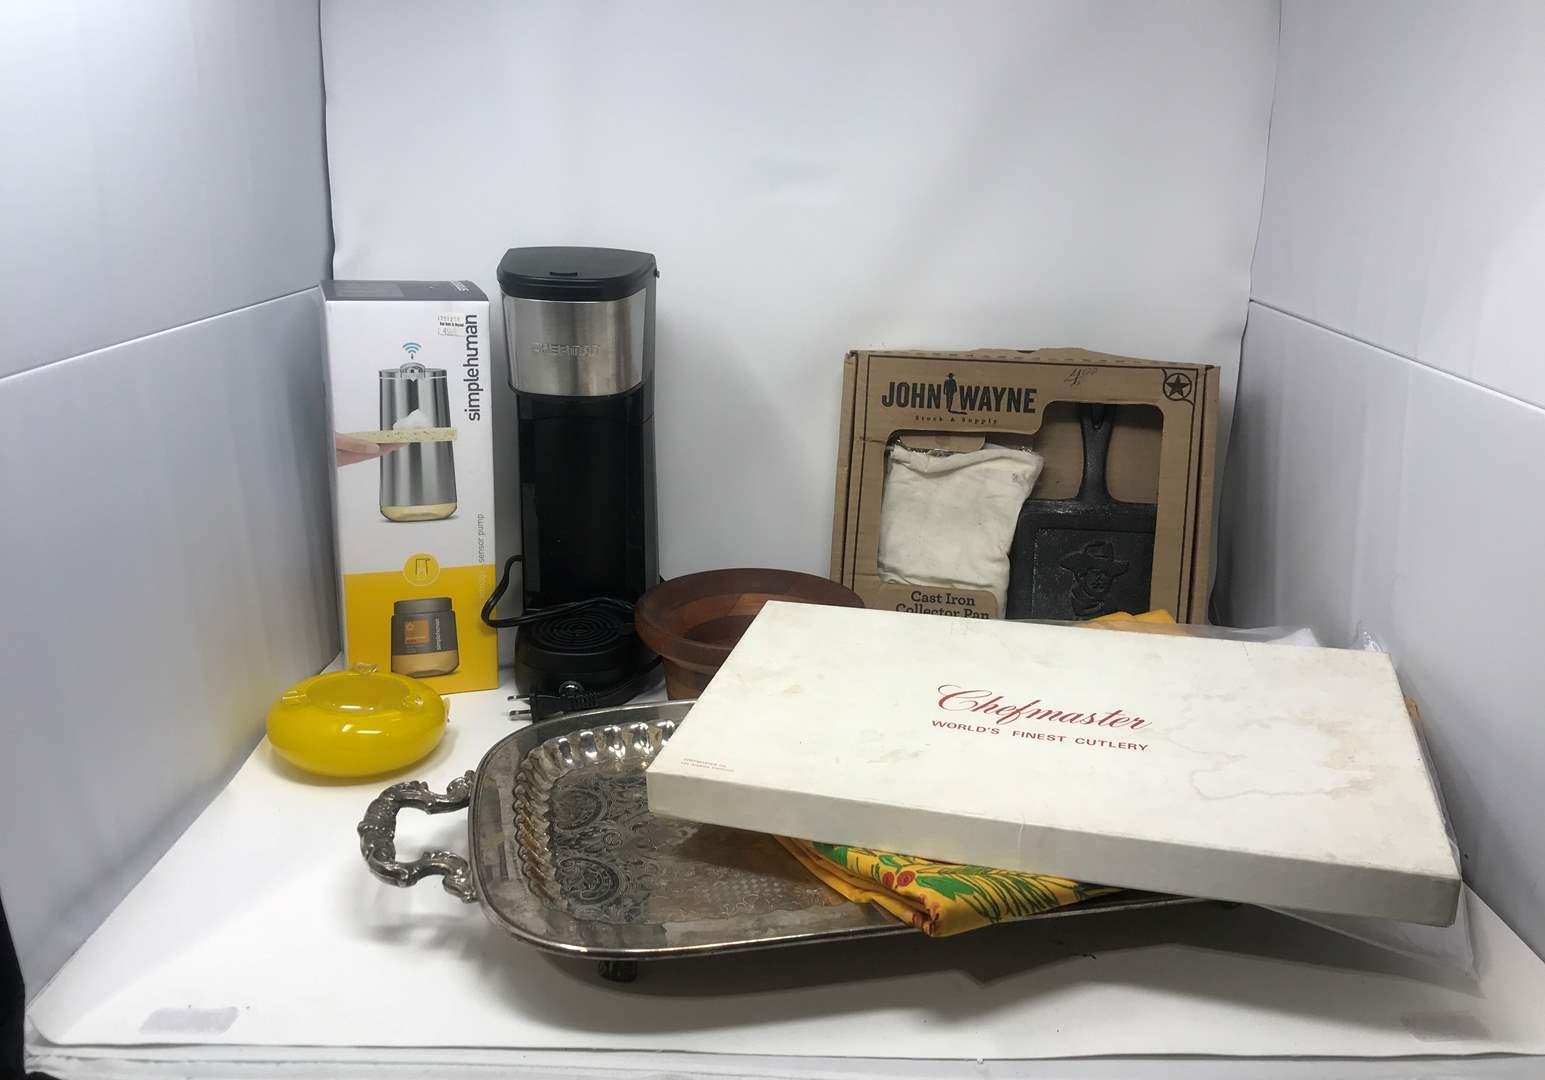 Lot # 101 - Simple Human Sensor Soap Dispenser, John Wane Cast Iron Skillet, Chefman Coffee Dispenser & More (main image)